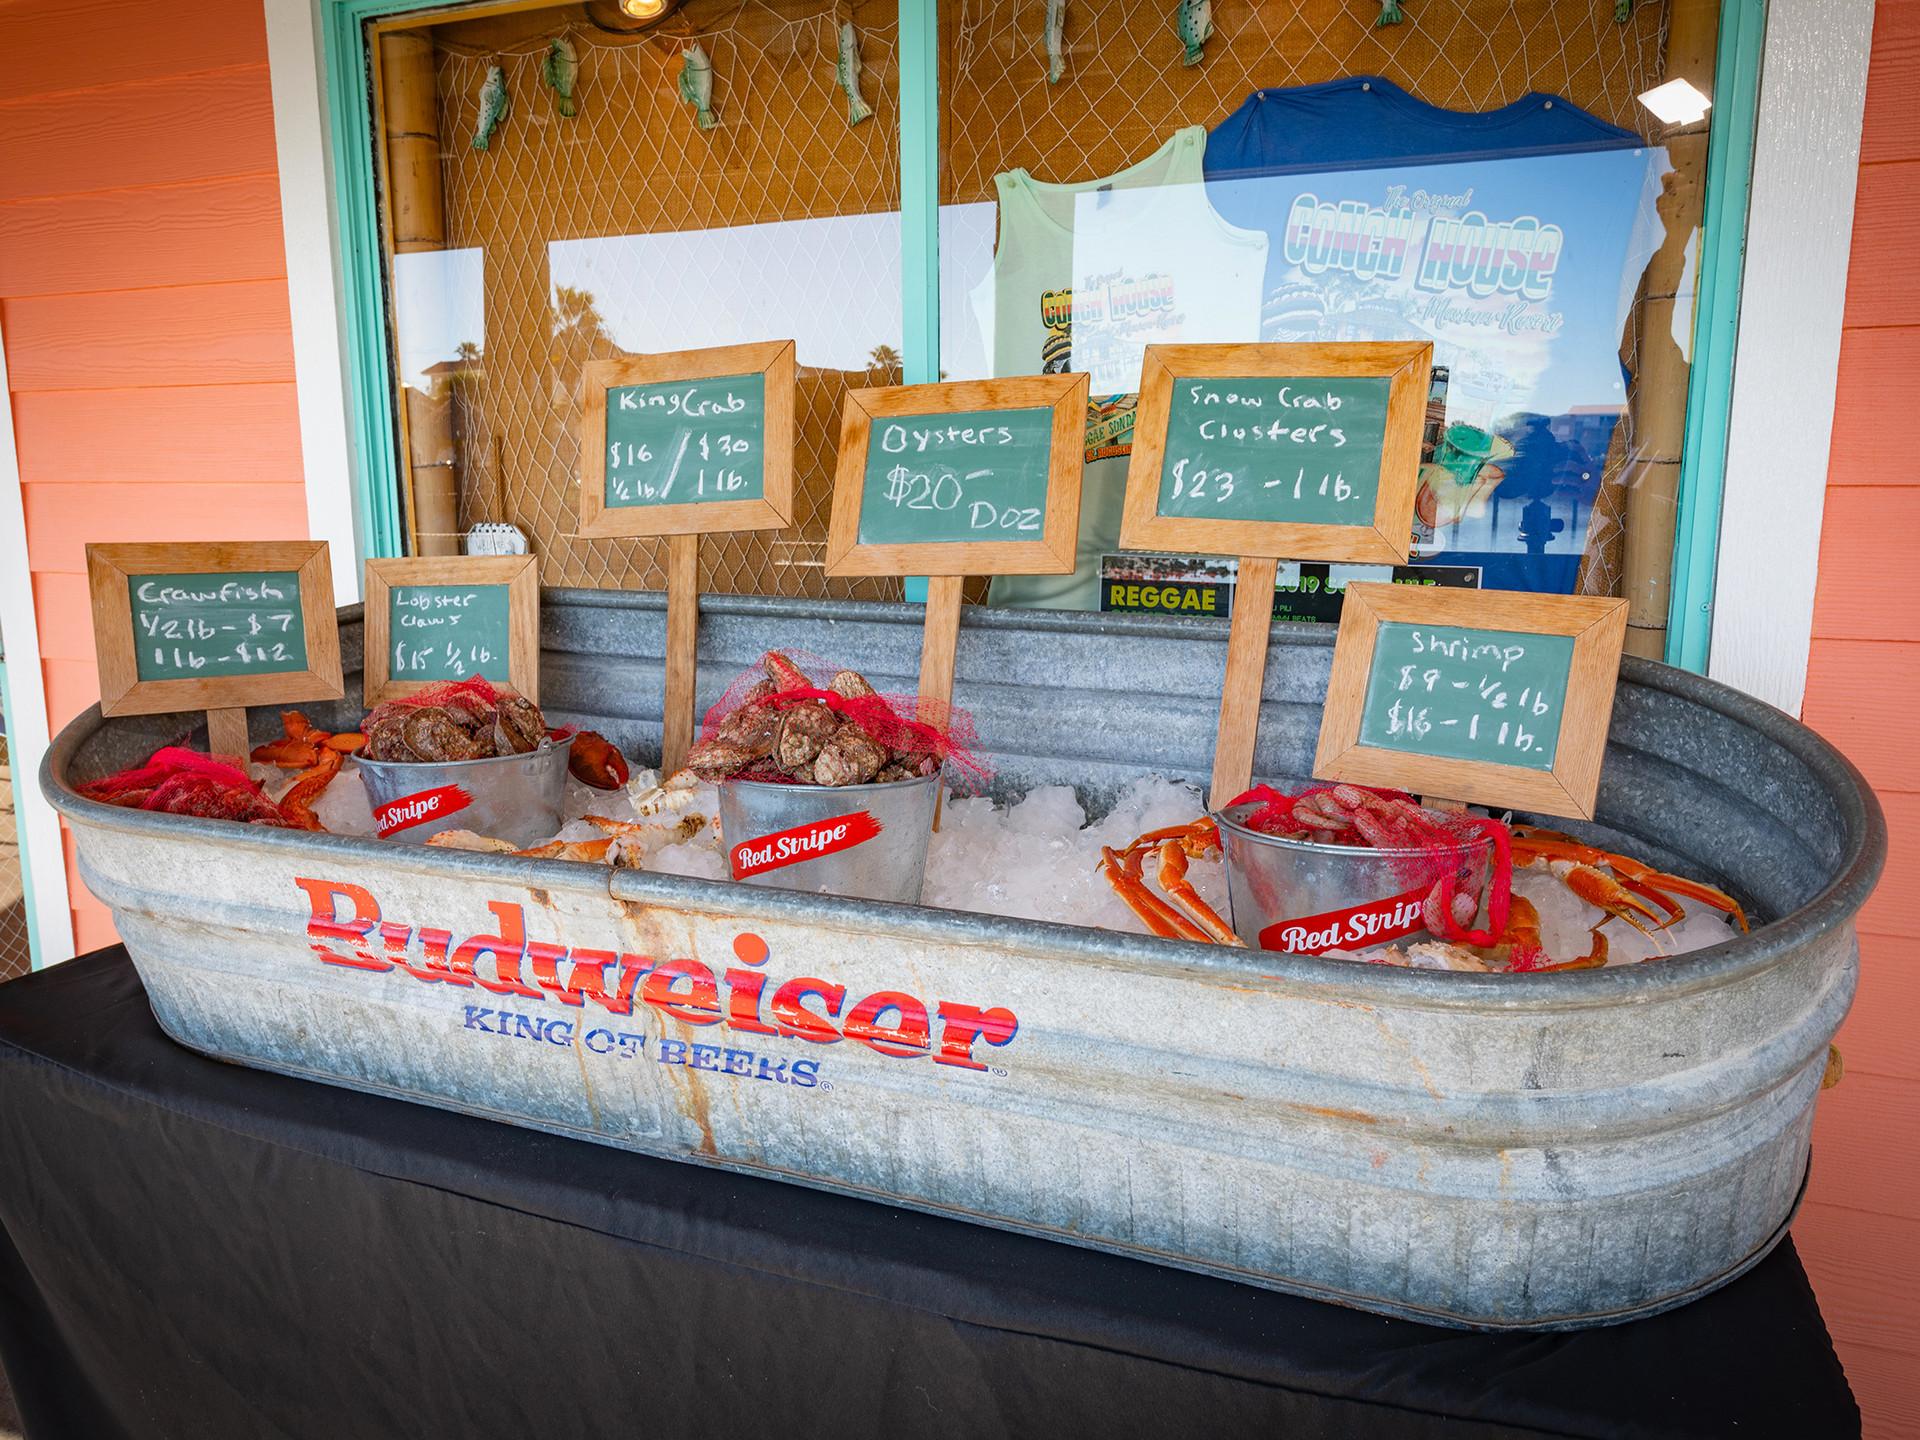 Conch House Marina Fresh Seafood Boil